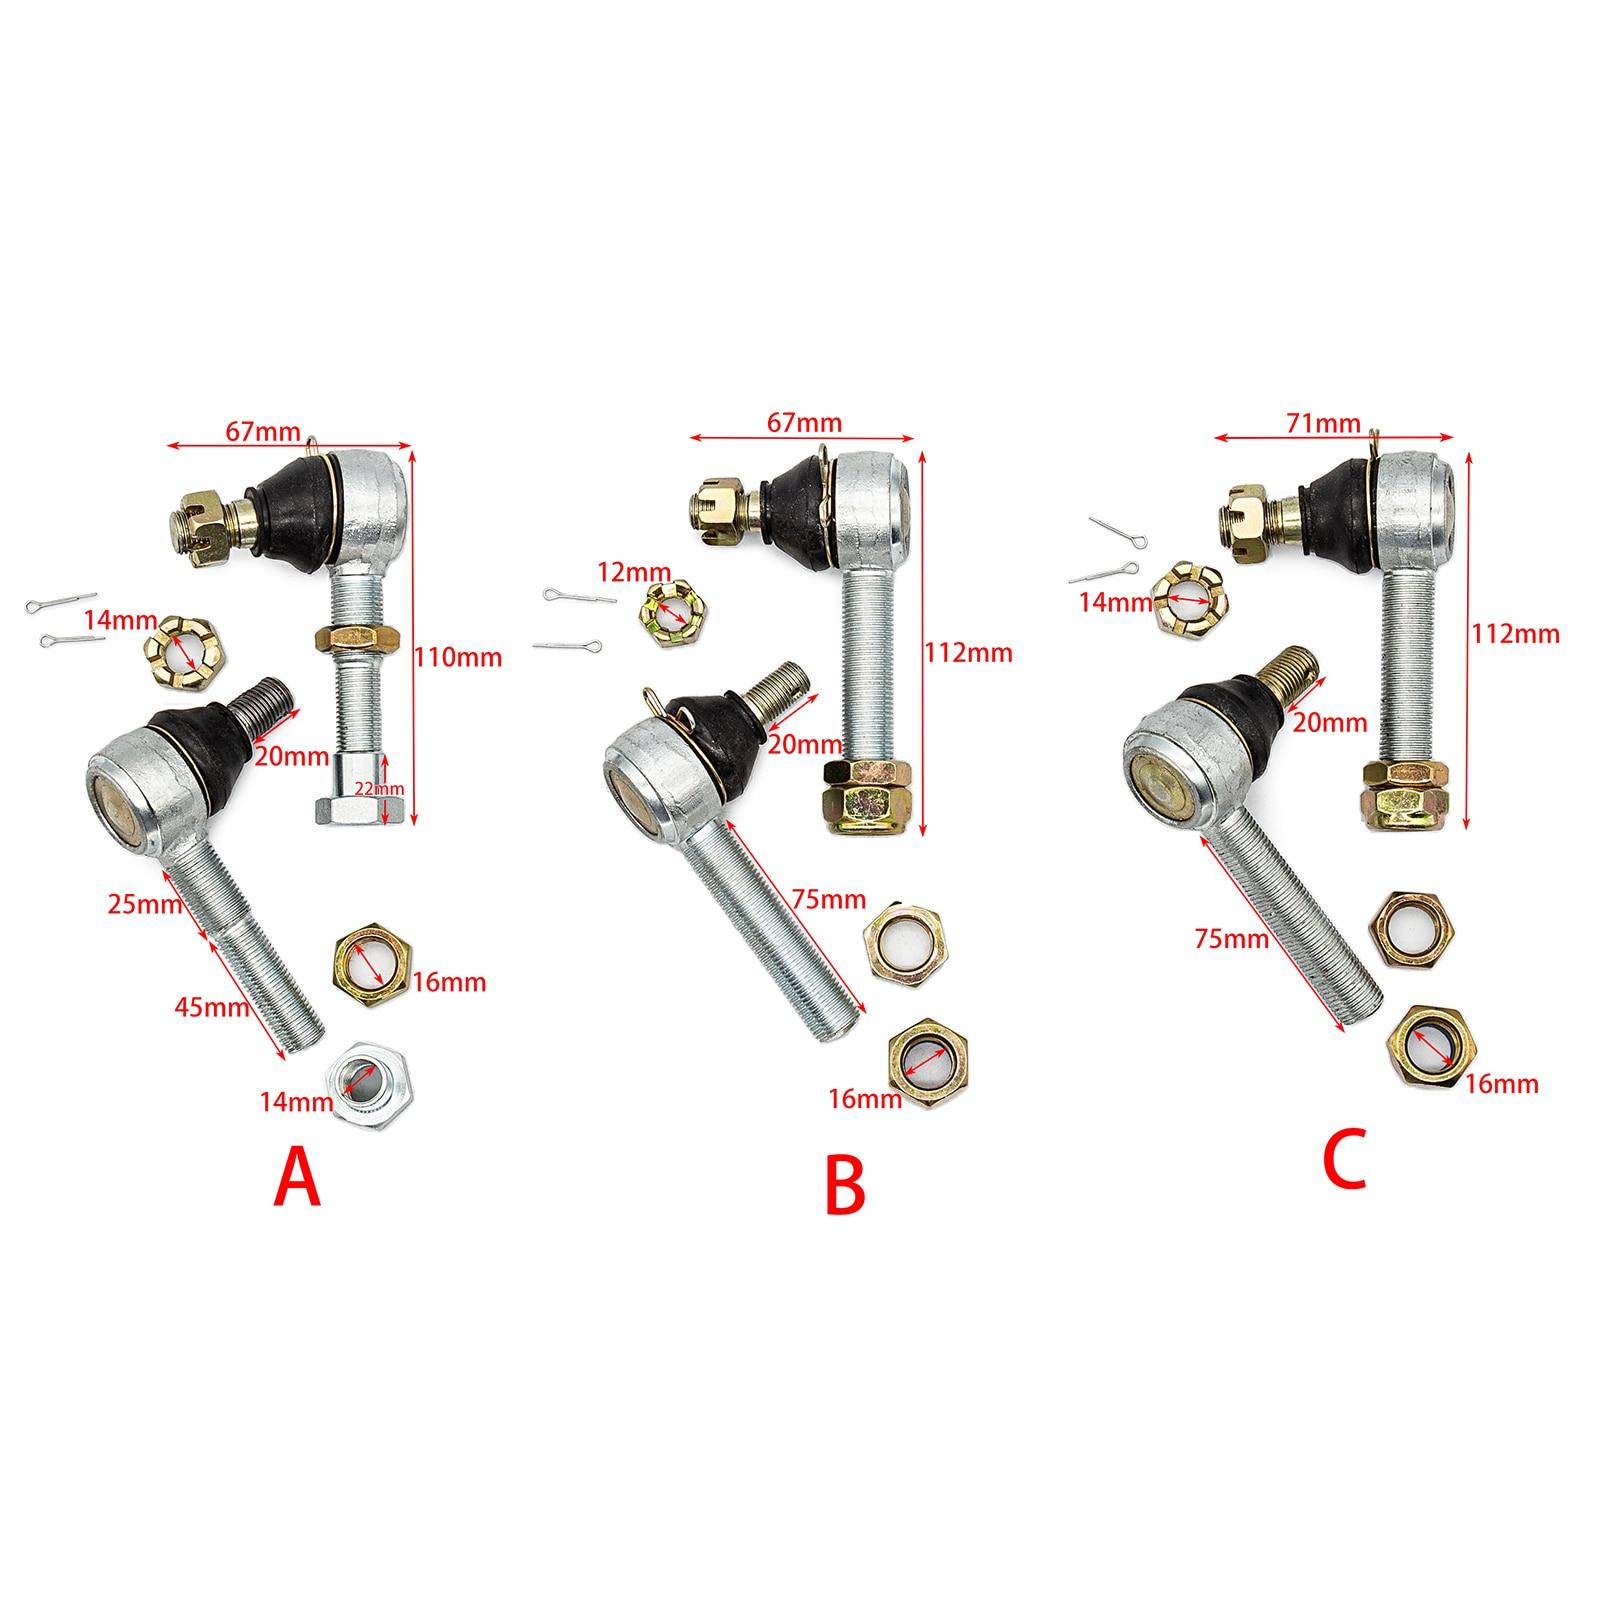 2 Pcs Hand Thread M16/M12/M14 Bolt Tie Rod End Ball Joint for 150cc 250cc Quad Dirt Bike ATV Go Kart Dune Buggy